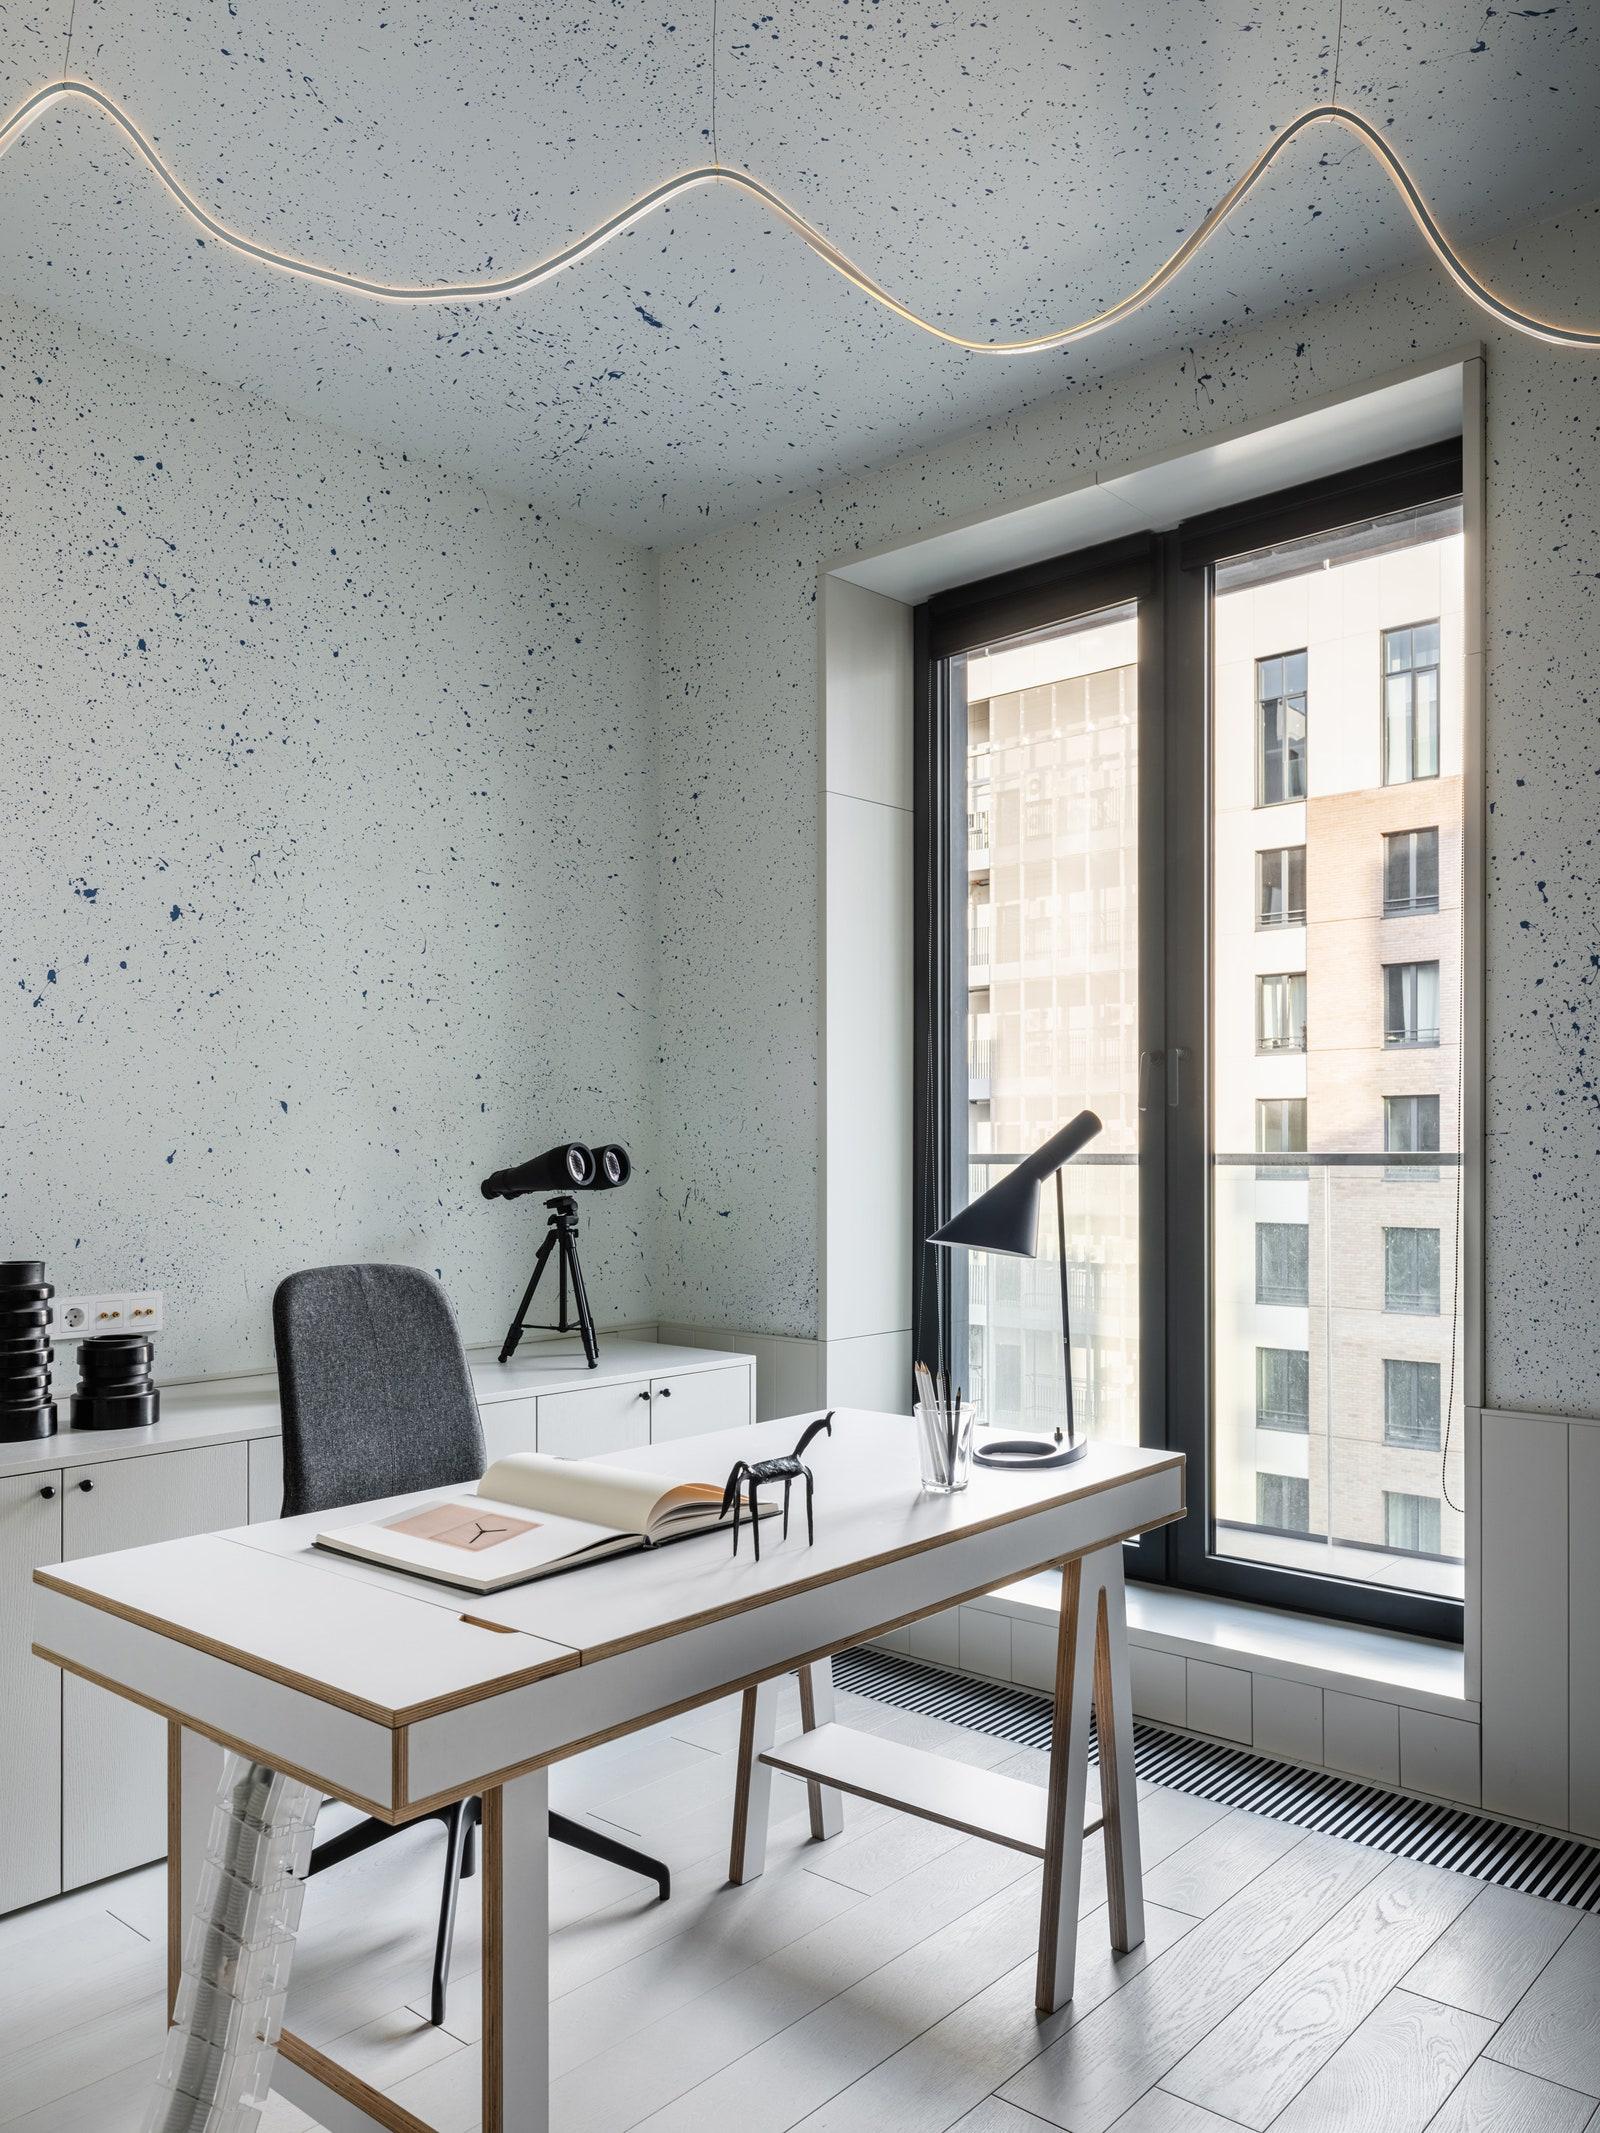 .        .  IKEA  Louis Poulsen Lappartement  HomeART.